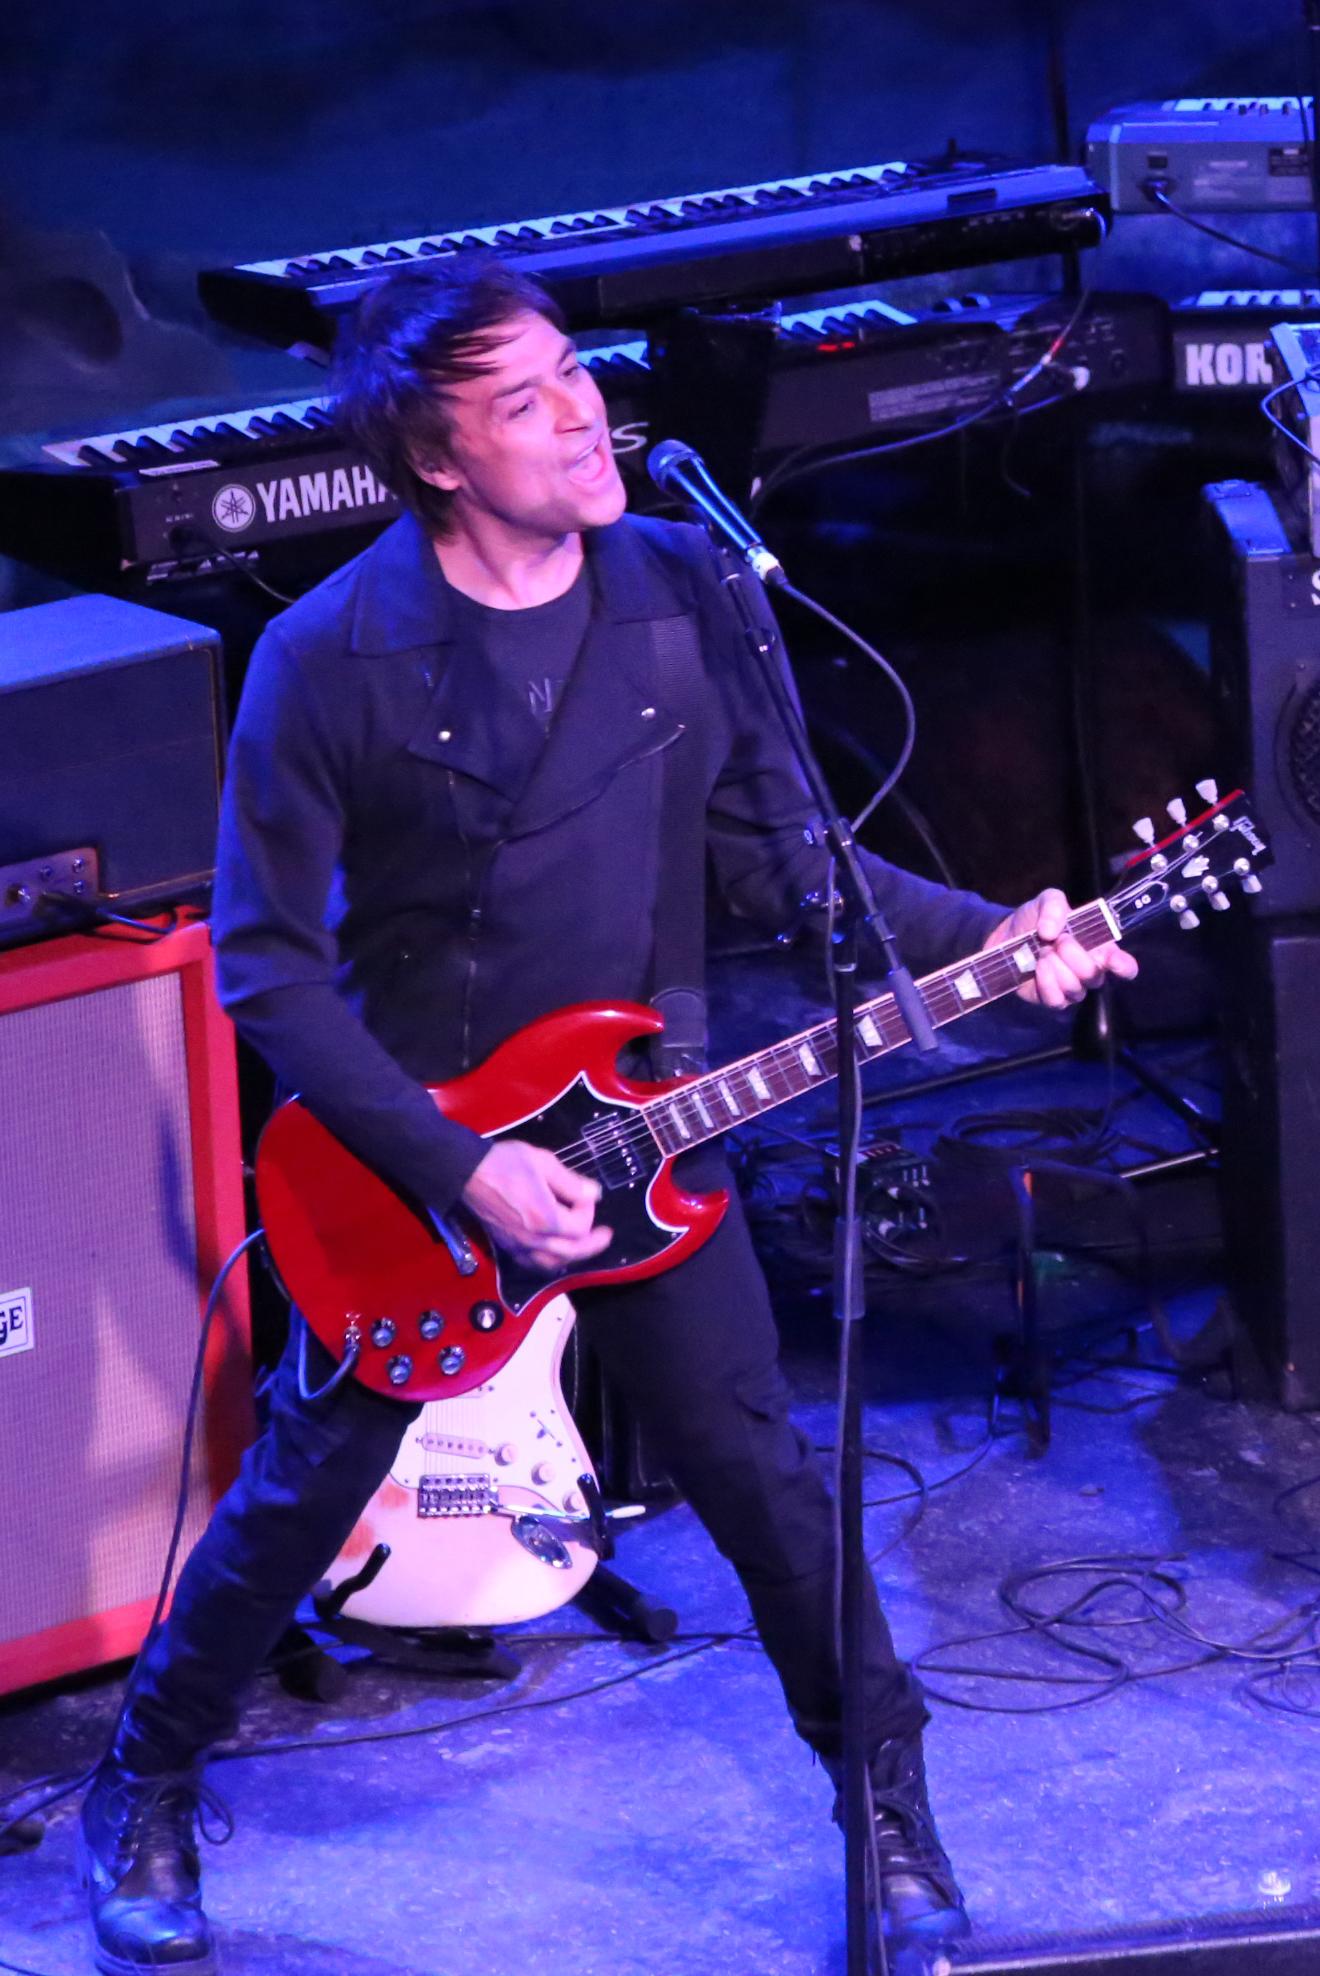 gord guitar